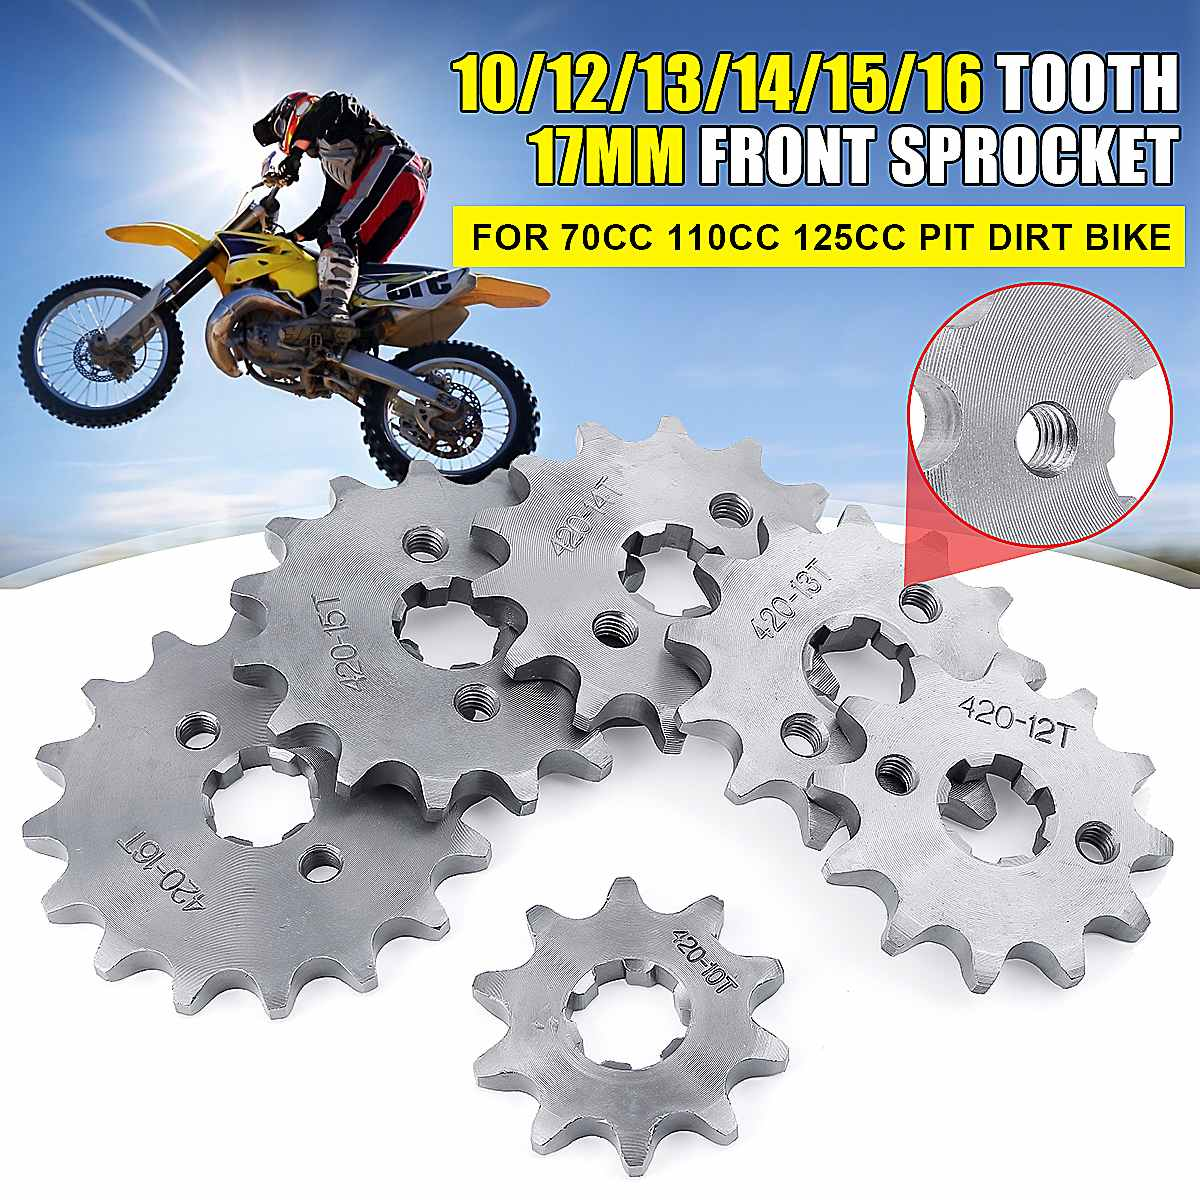 Rueda dentada delantera de 17mm para Mini motocicleta tipo Pit Dirt Bike de 70CC, 110CC, 125cc, 10/11/12/13/14/15/16/17/18/19